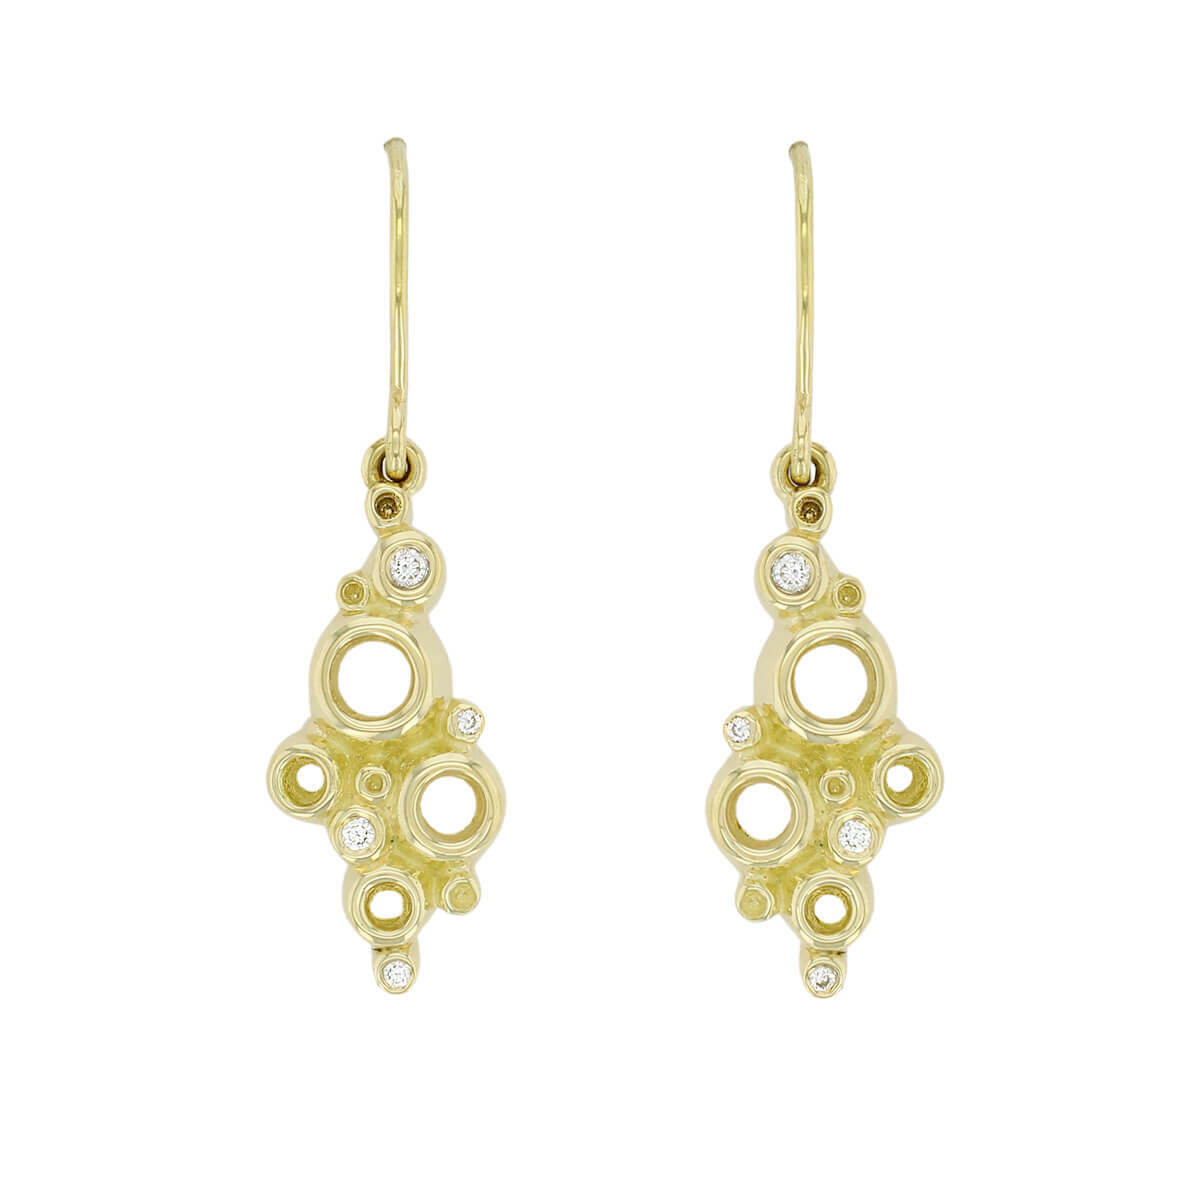 Faller Fizz 18ct yellow gold diamond drop earrings, designer jewellery, jewelry, handcafted